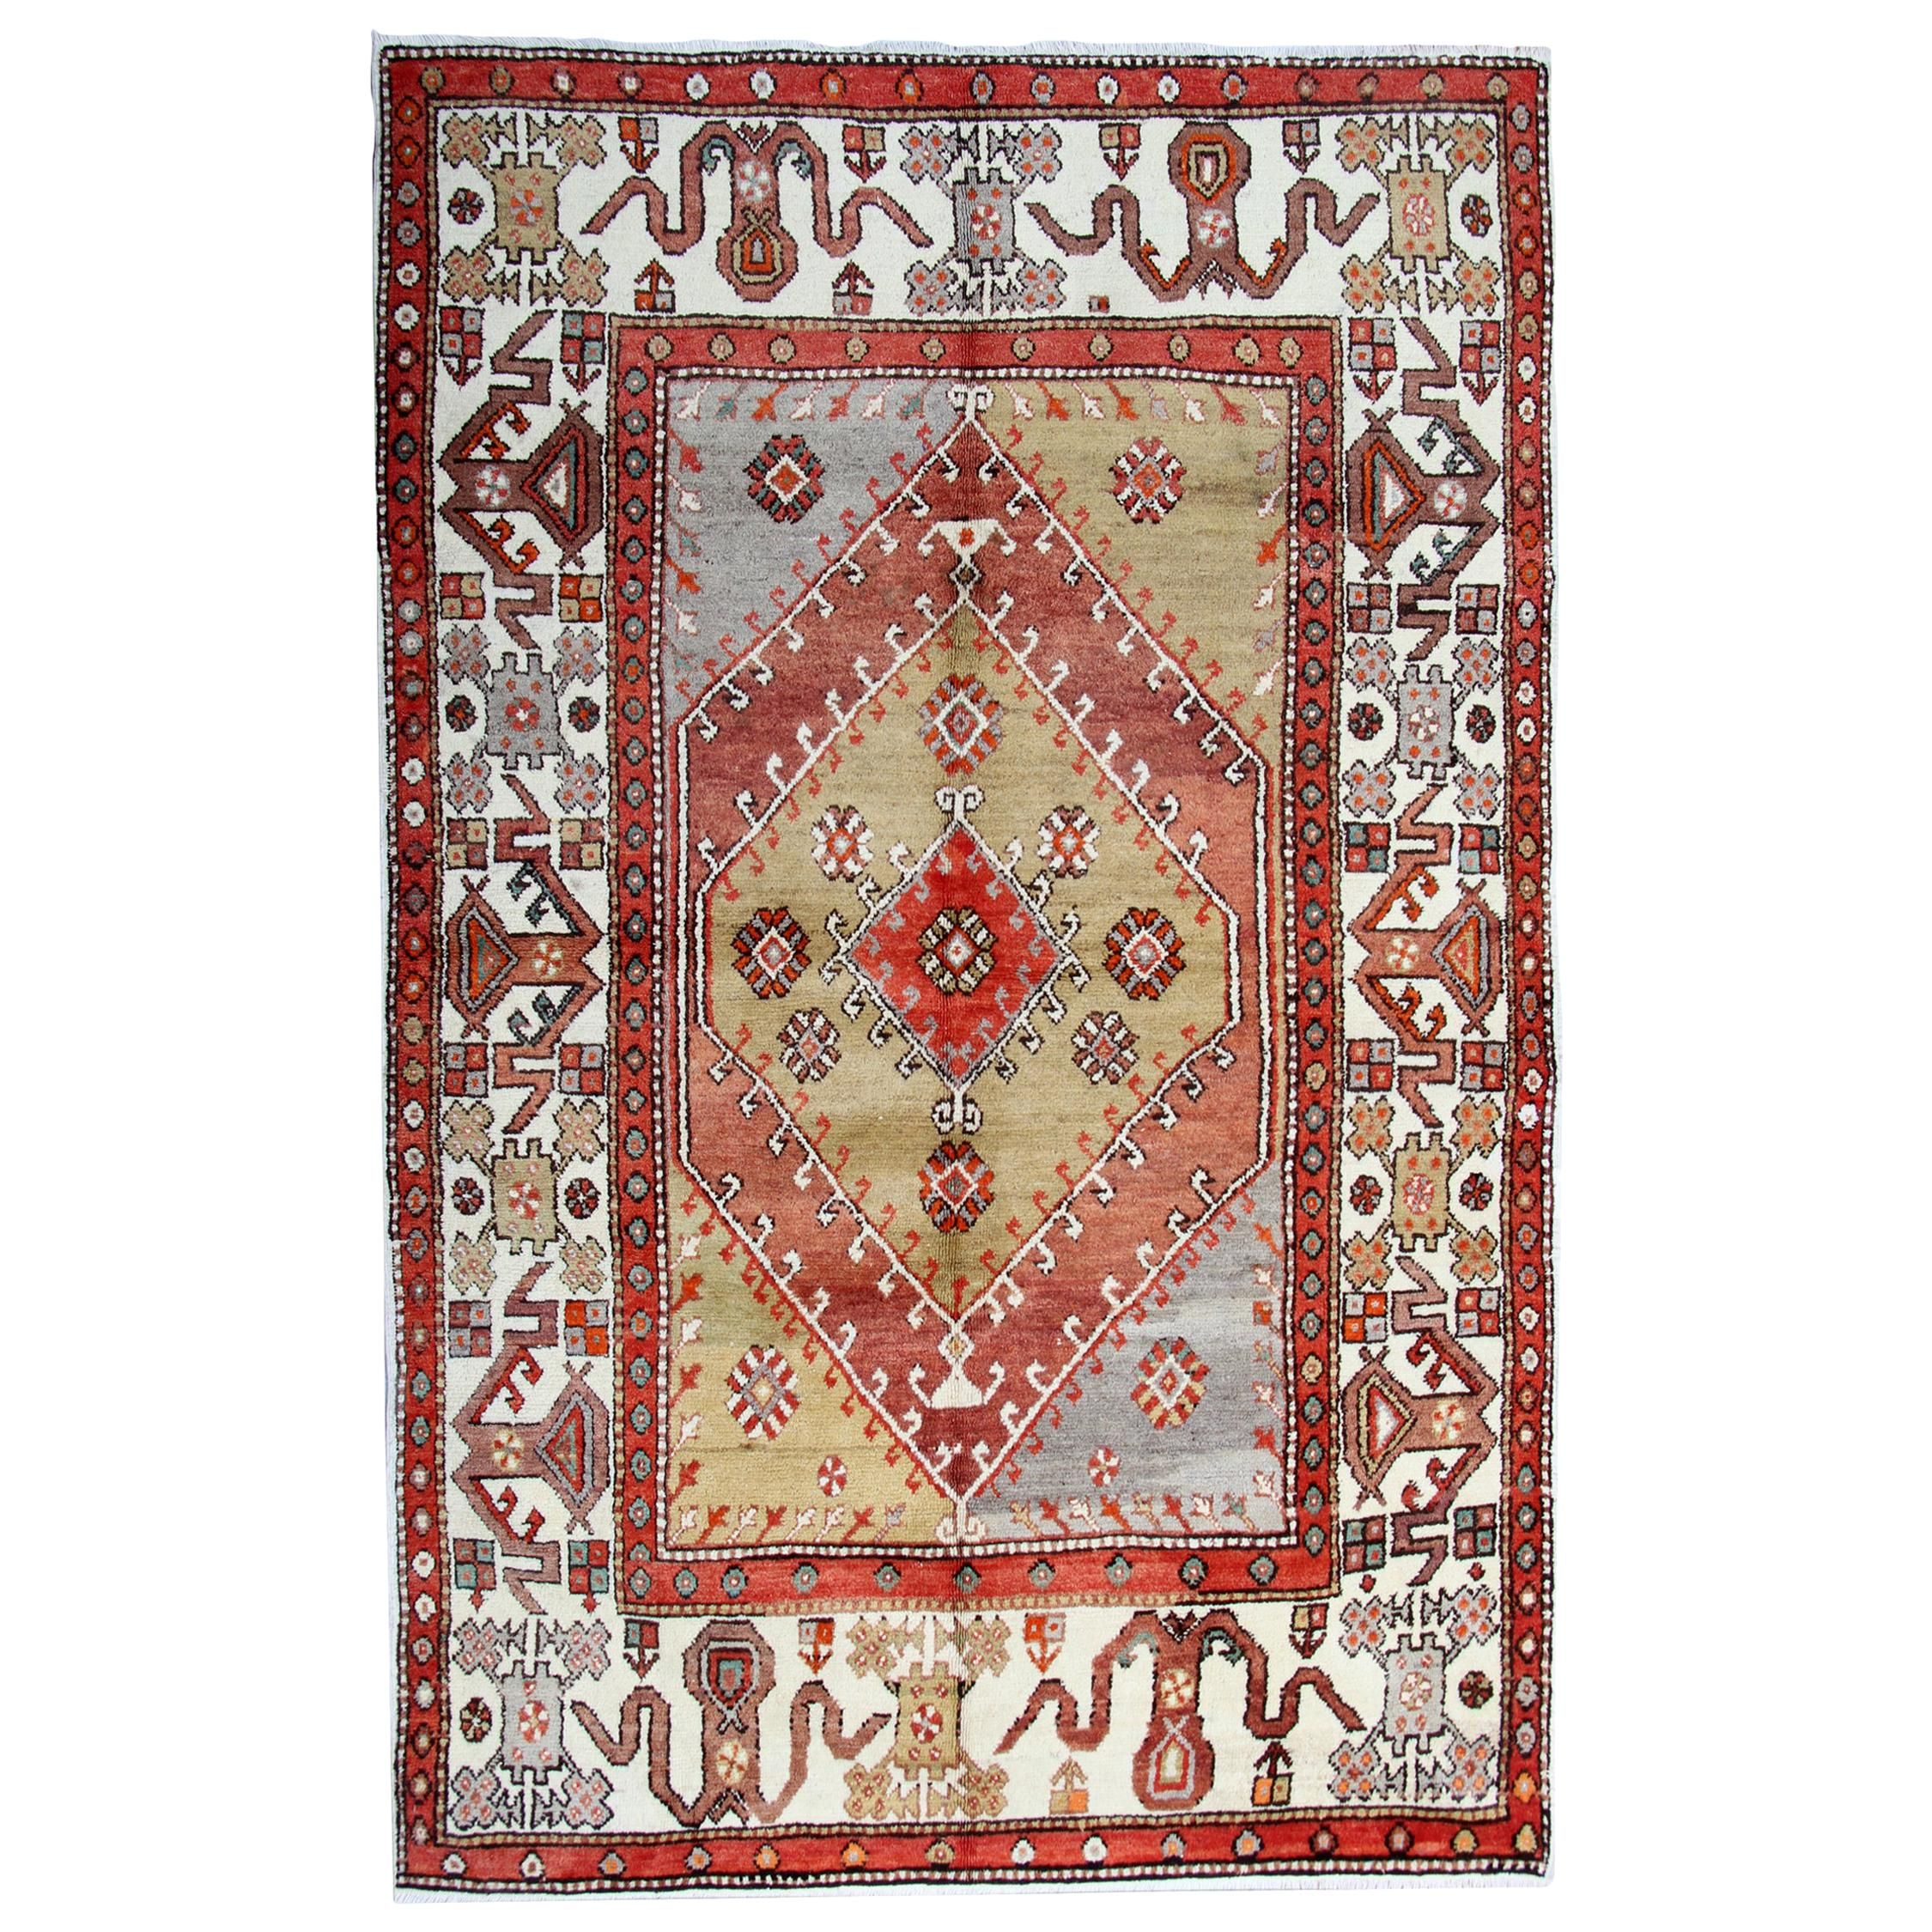 Handmade Carpet Antique Rug, Turkish Rug, Wool Oriental Rug Knitted Carpet